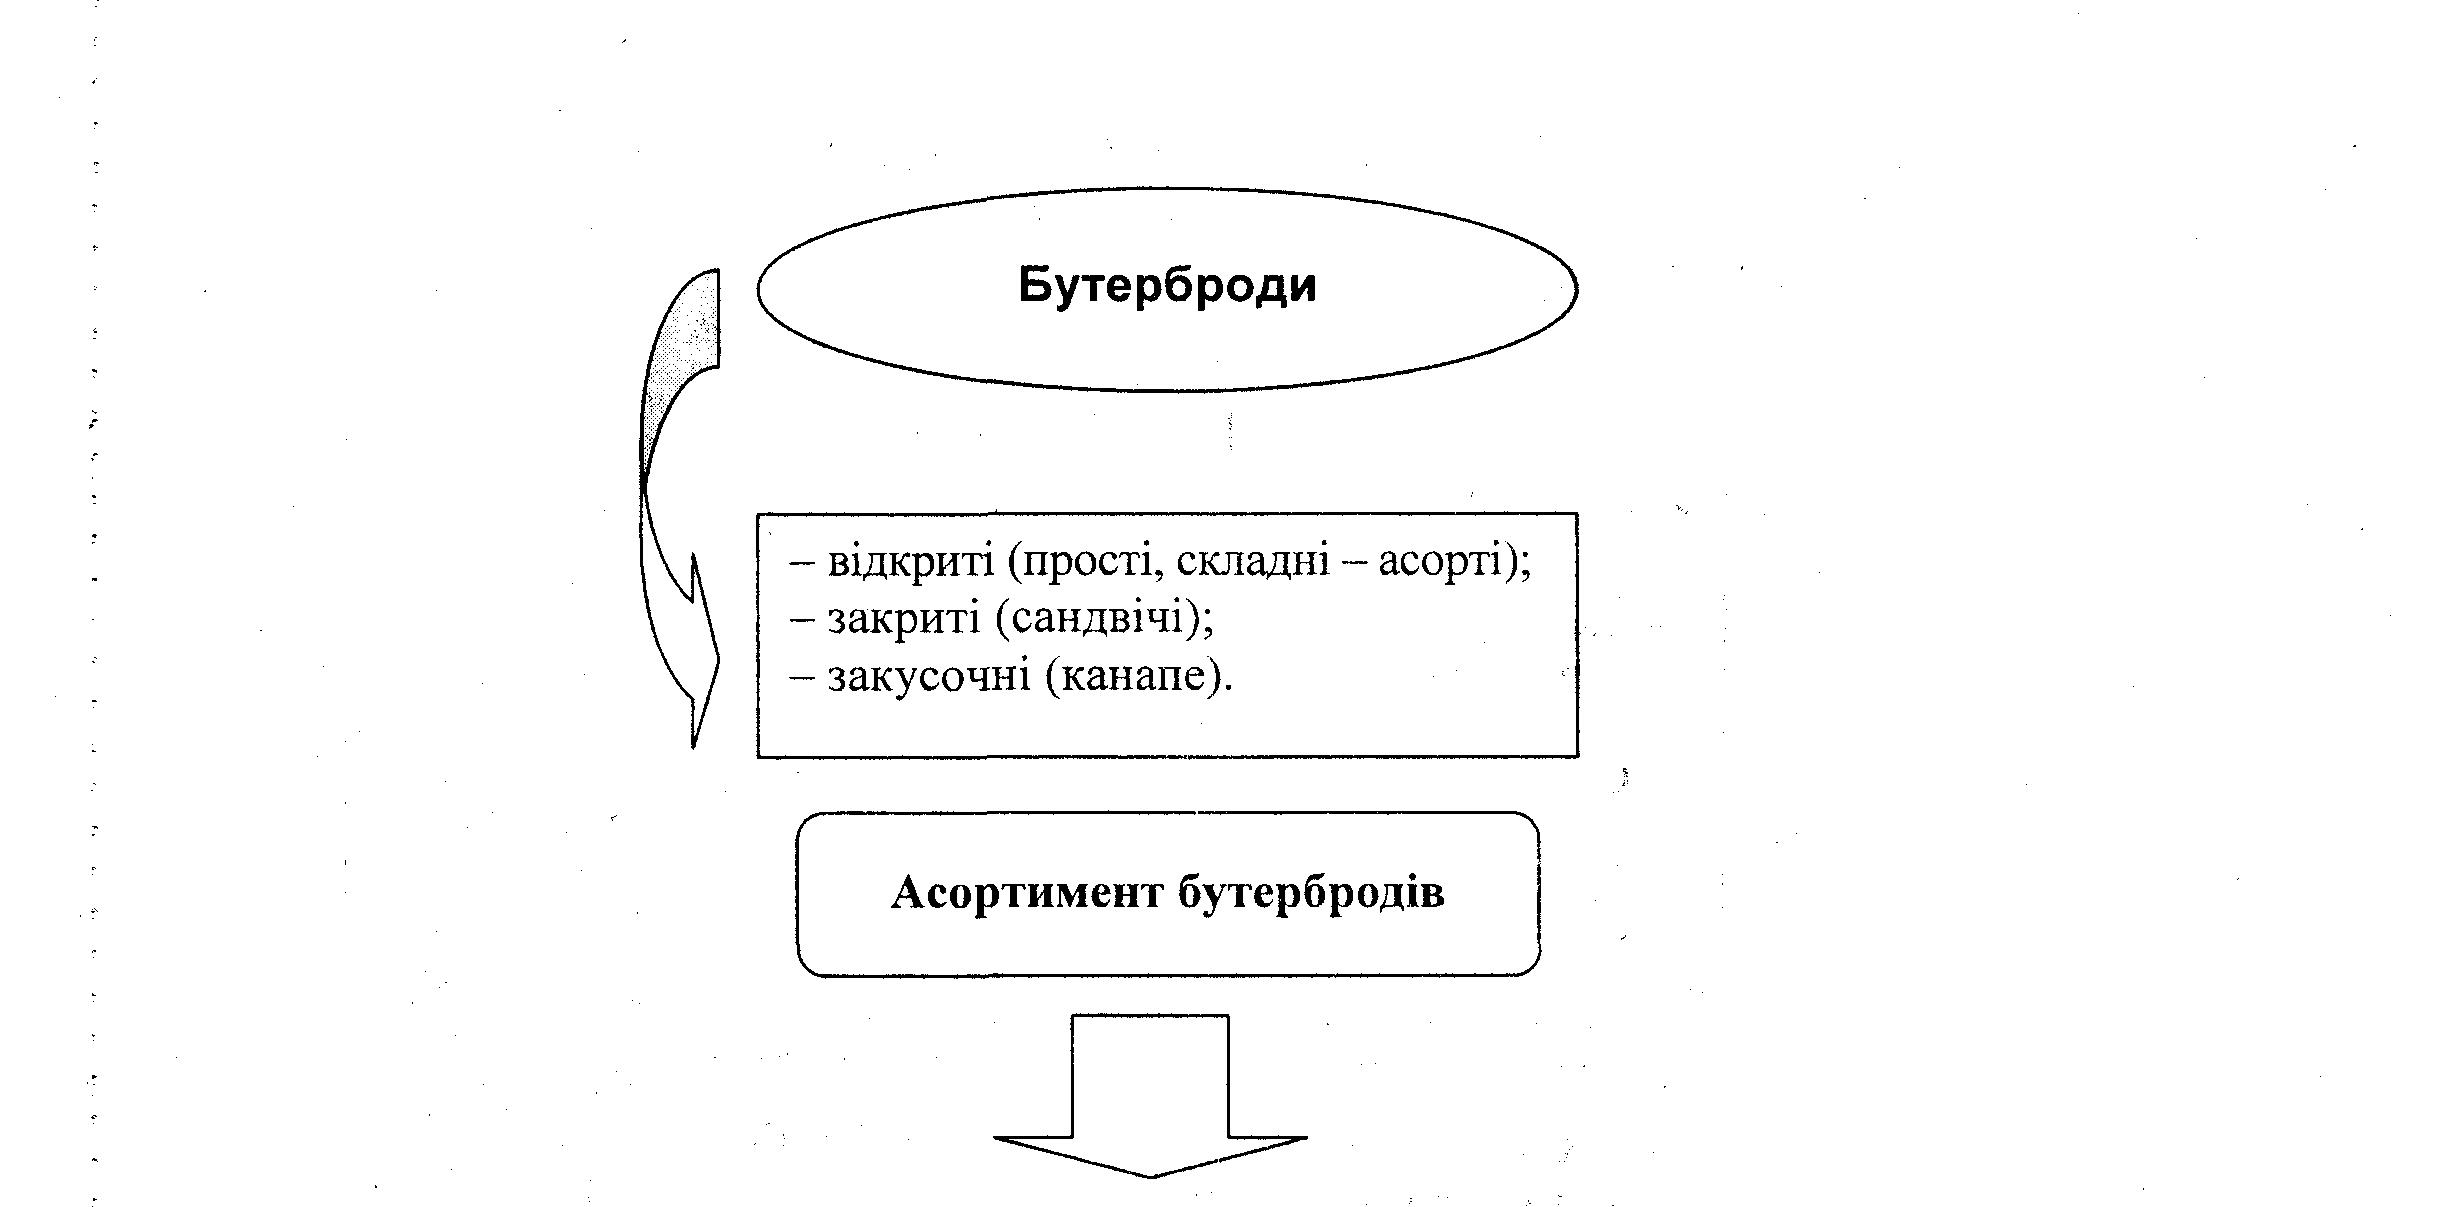 https://studfile.net/html/2706/1284/html__JpuBZohHm.Vnrf/img-9sCOk5.png